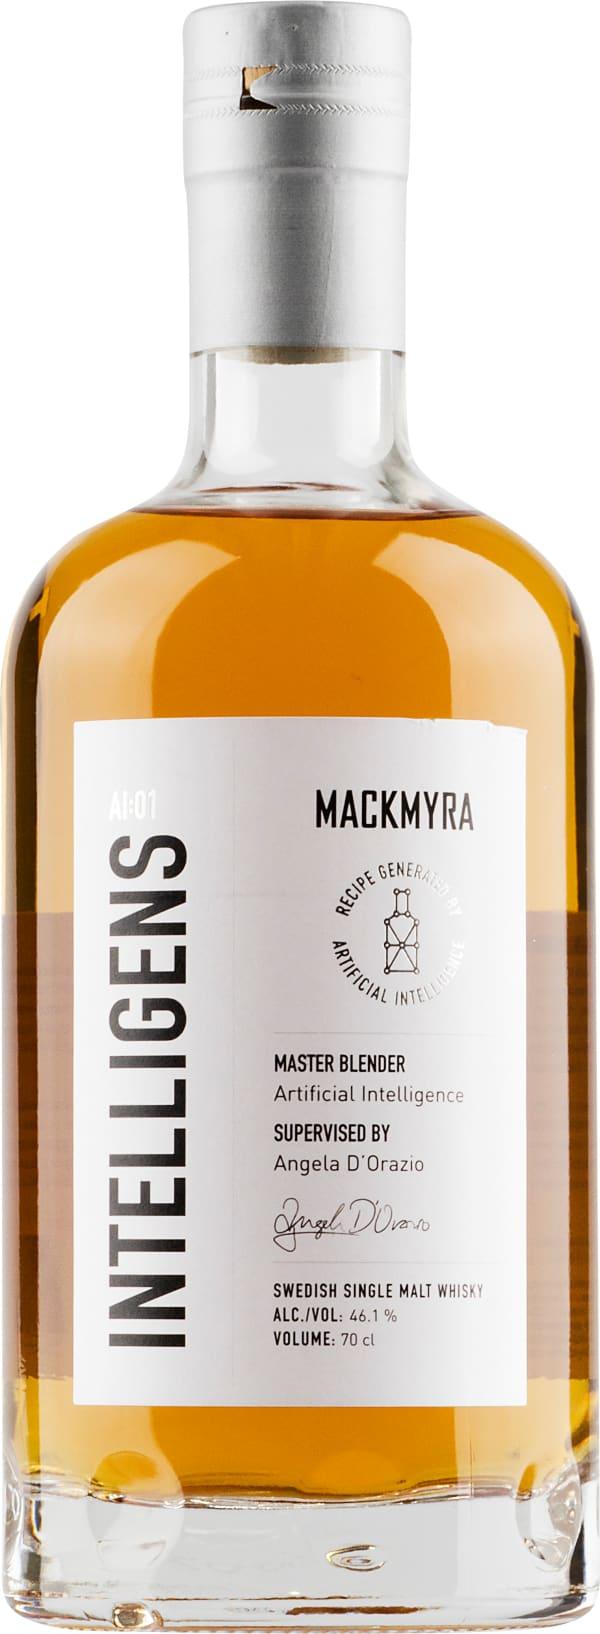 Mackmyra Intelligens Single Malt